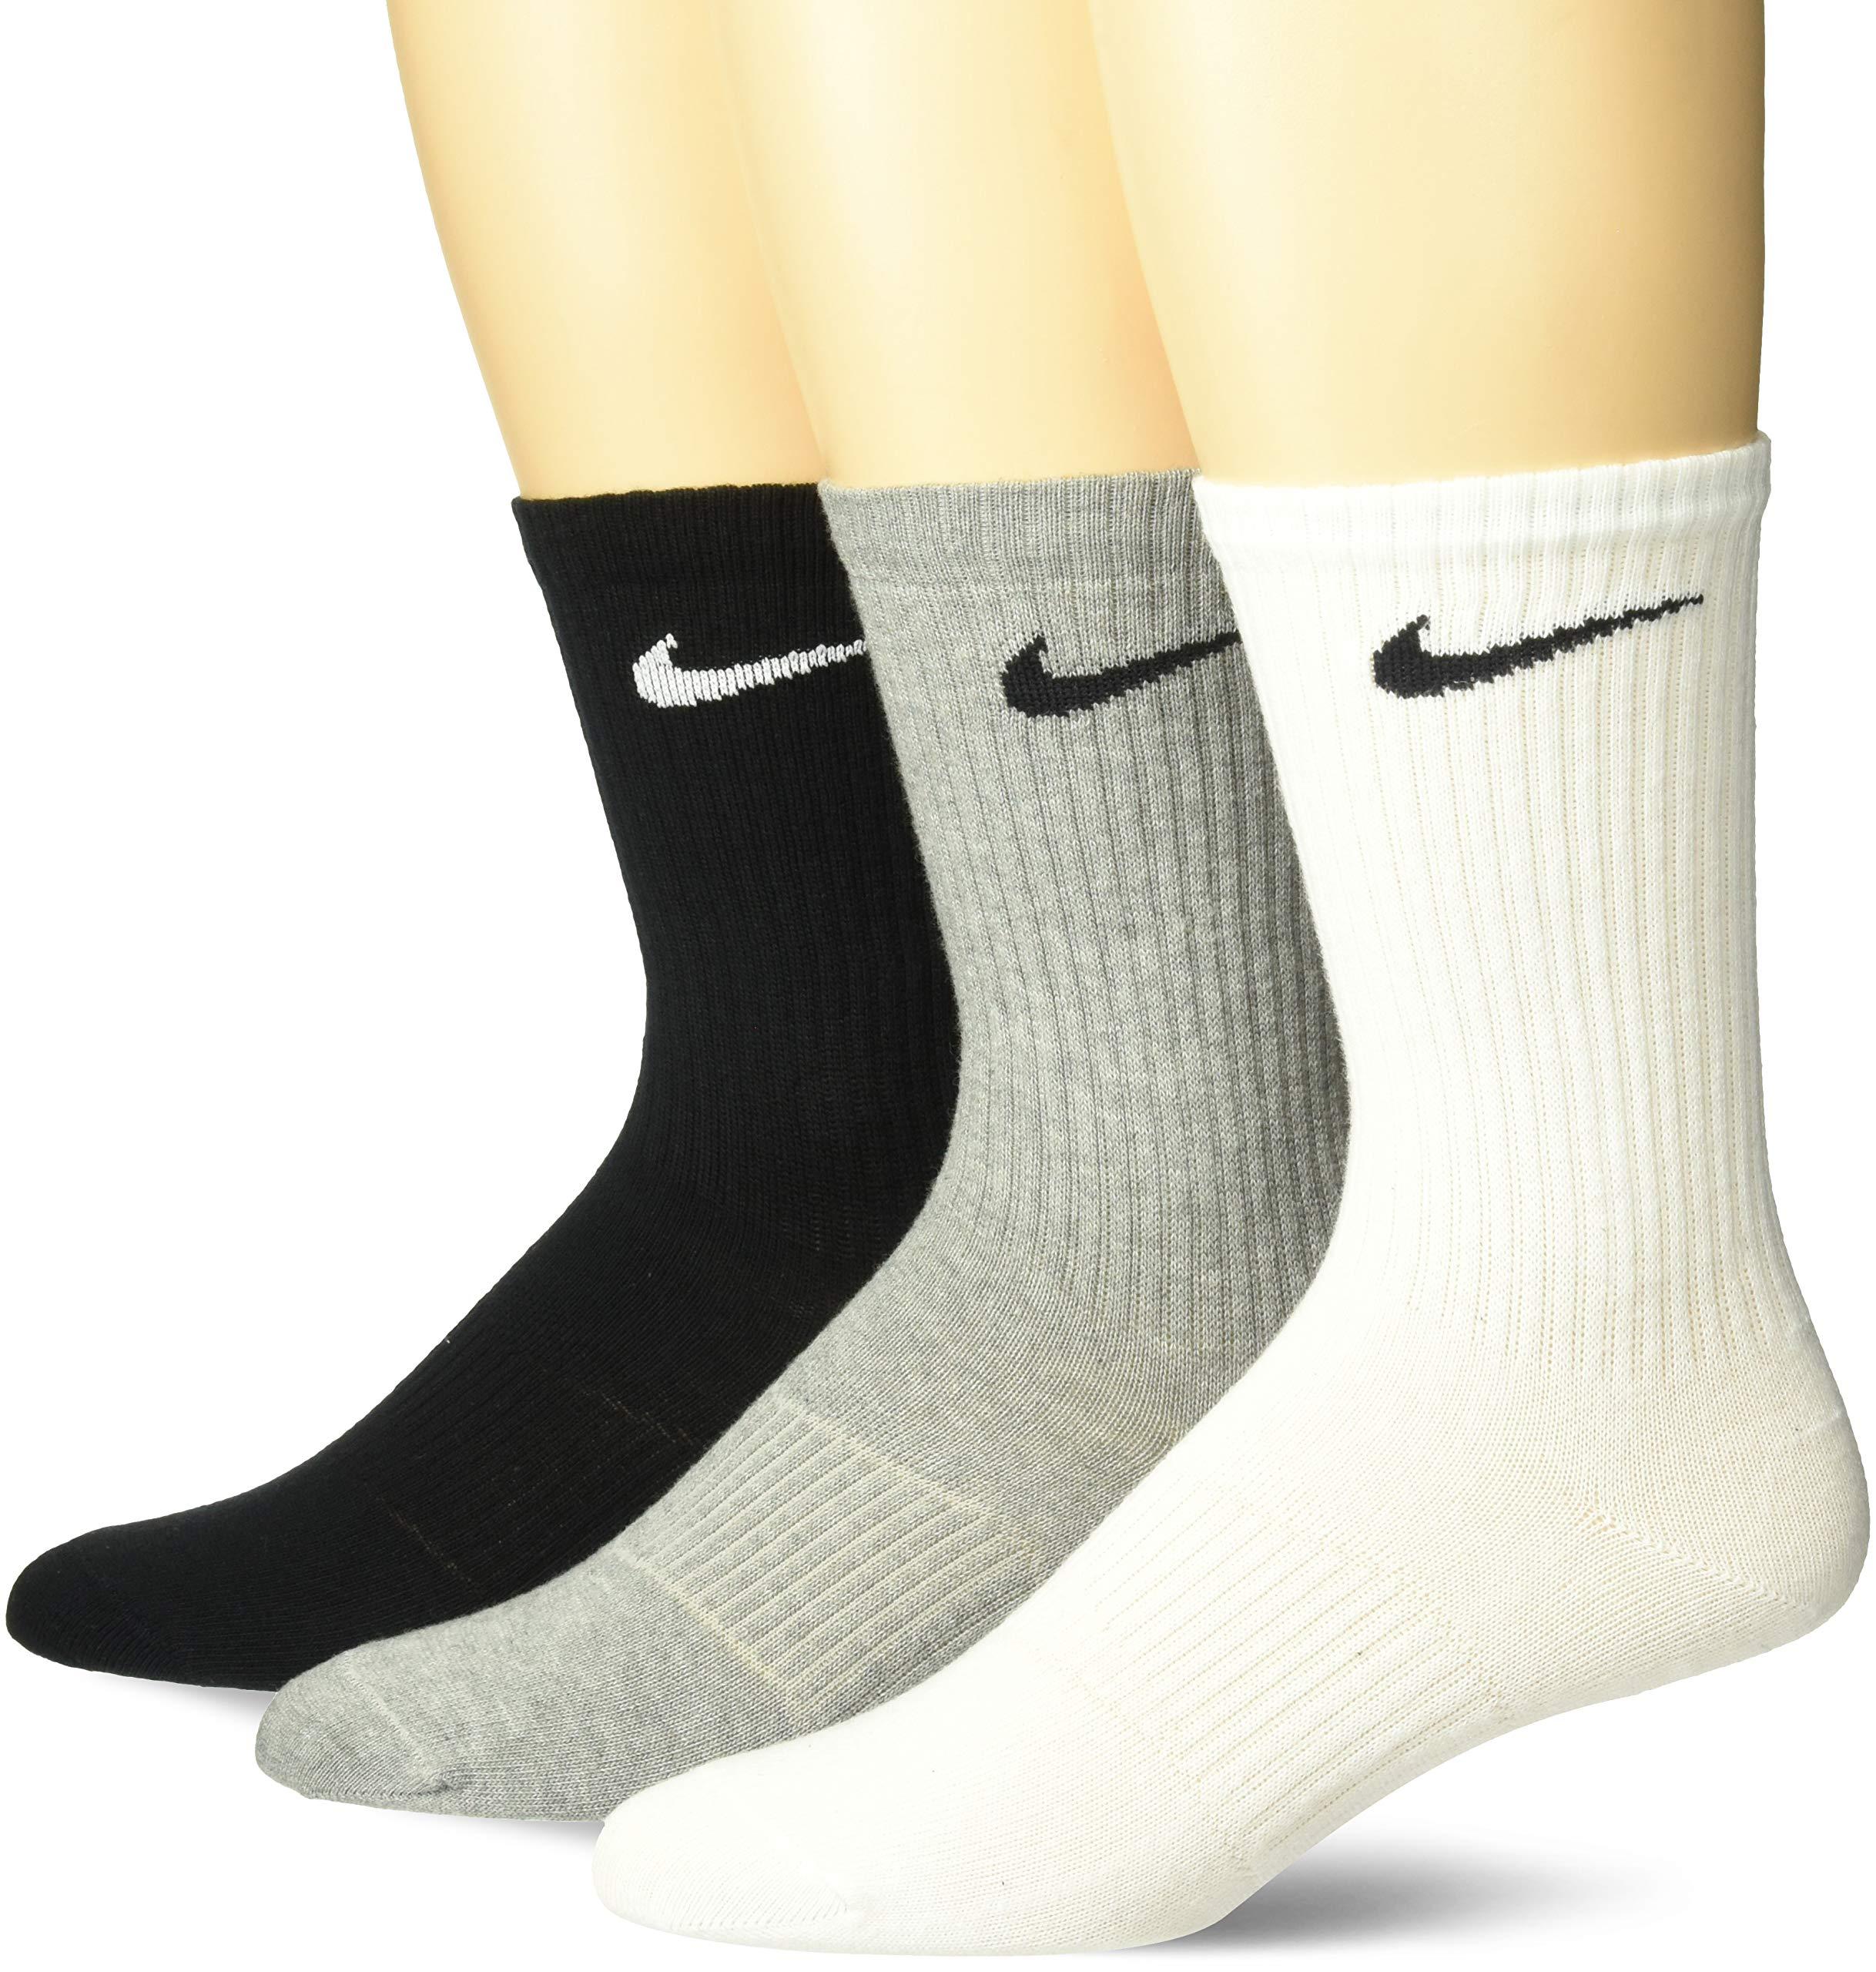 NIKE Men's Lightweight Crew Socks (Pack of 3), White/Grey/Black, Medium by Nike